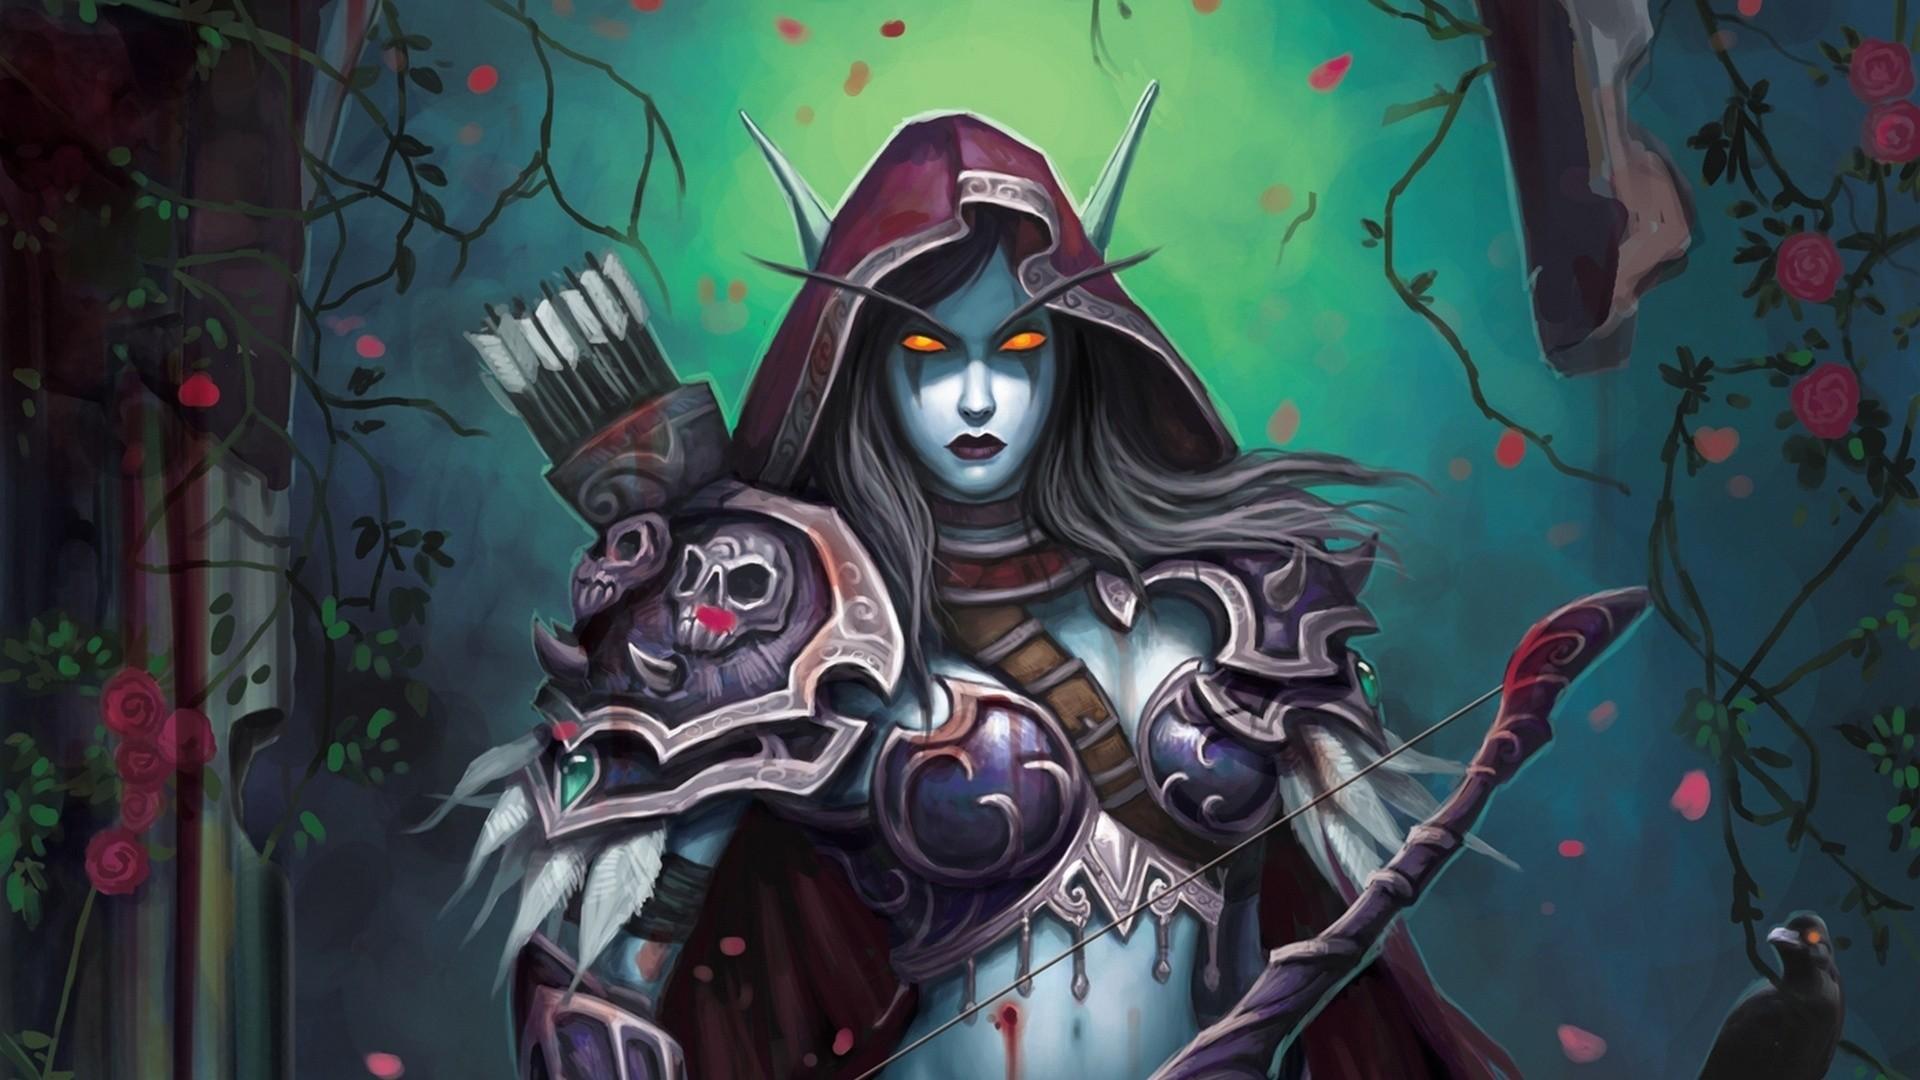 Res: 1920x1080, Elf, Fantasy, Elf, Wow, World Of Warcraft, Lady Sylvanas Windrunner